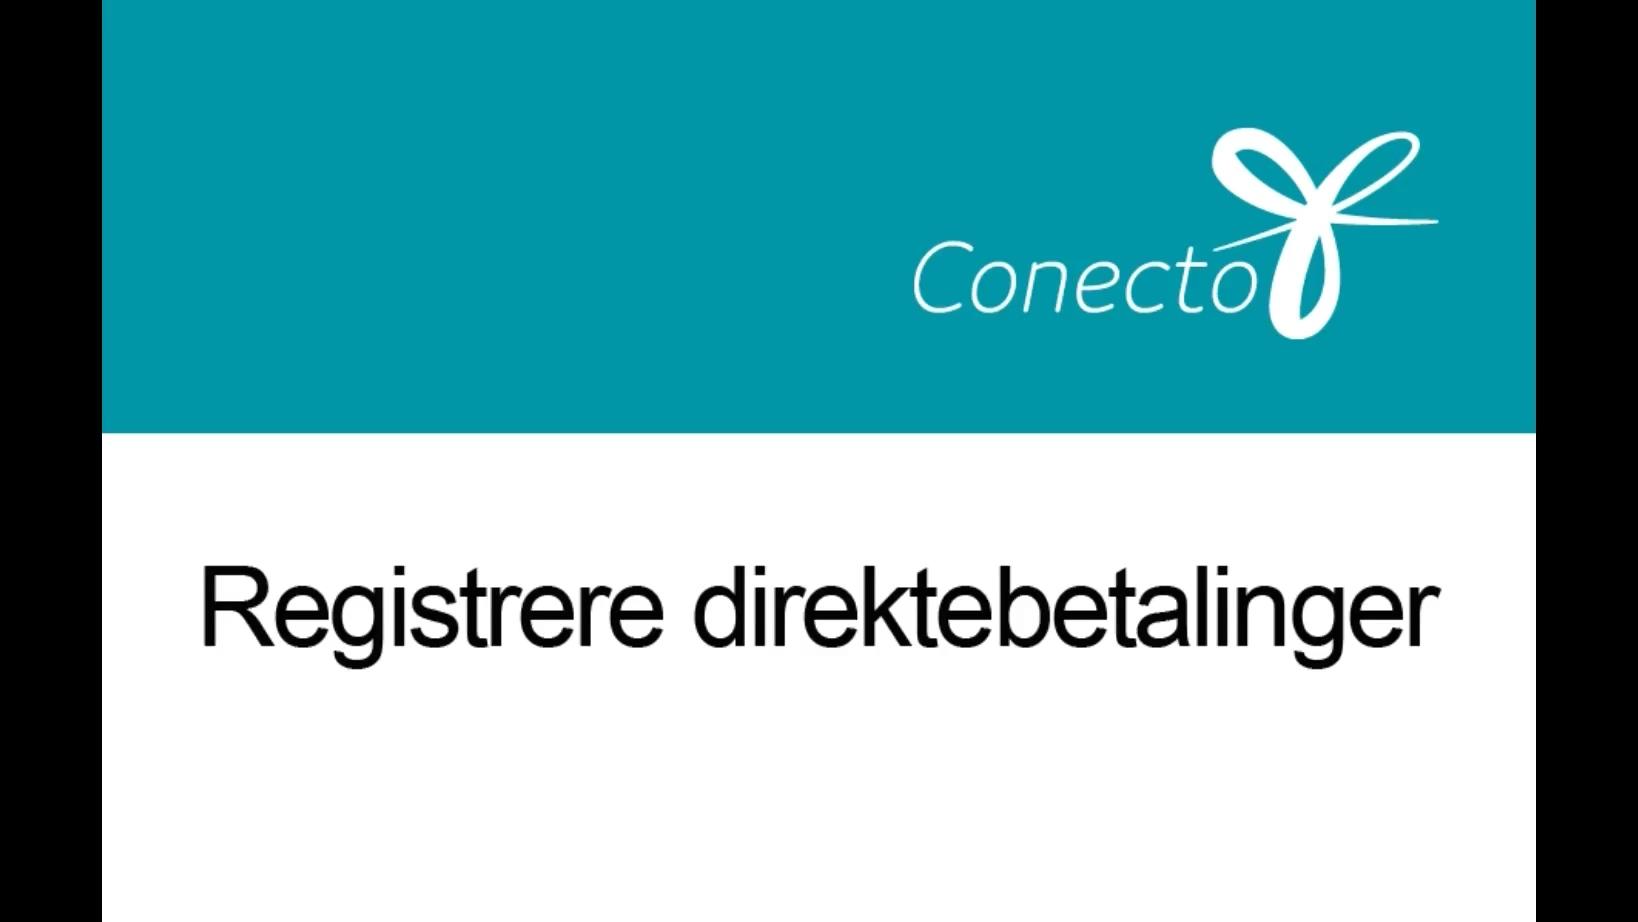 registrere_direktebetalinger